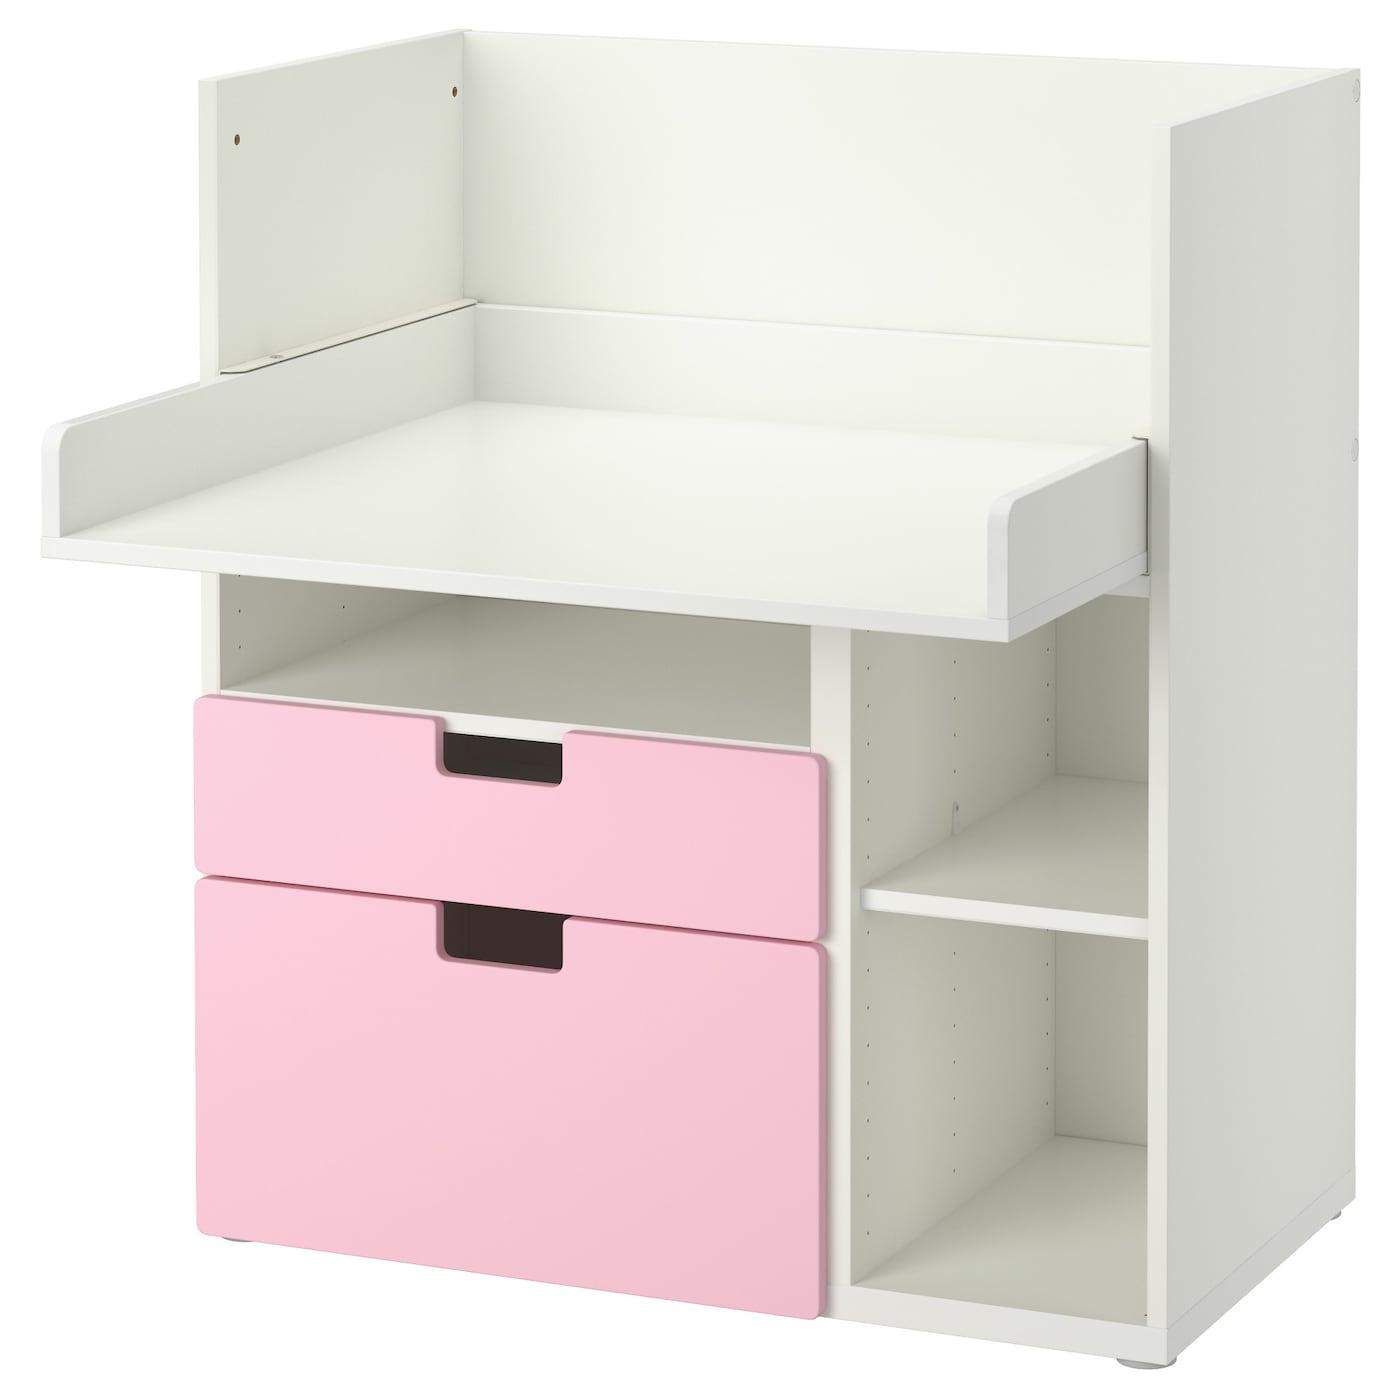 Stuva desk with 2 drawers white pink 90x79x102 cm ikea - Ikea desk drawer organizer ...